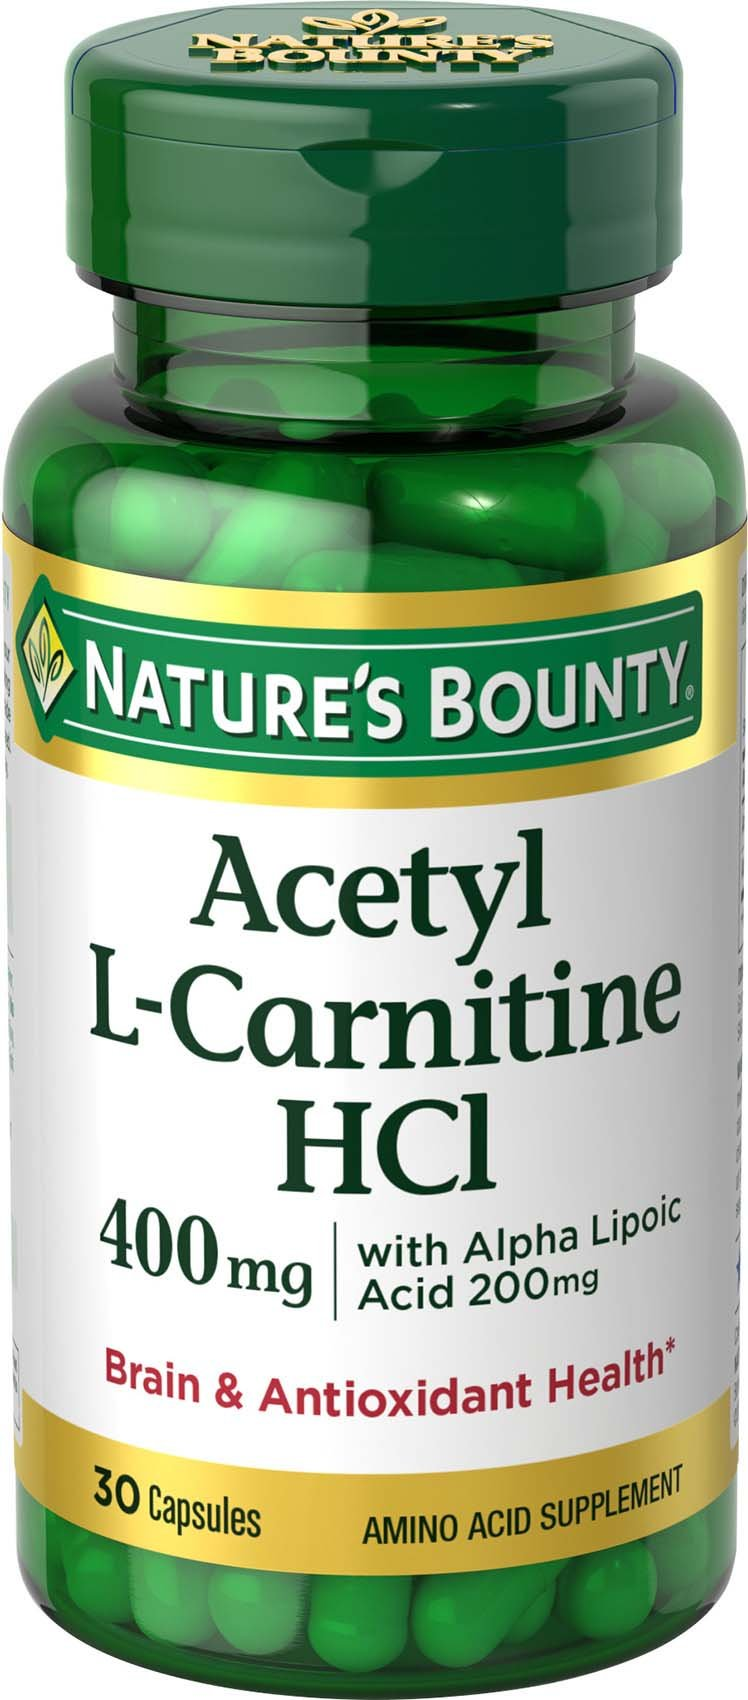 Nature's Bounty® L-Carnitine 400 mg & ALA 200 mg, 30 Capsules